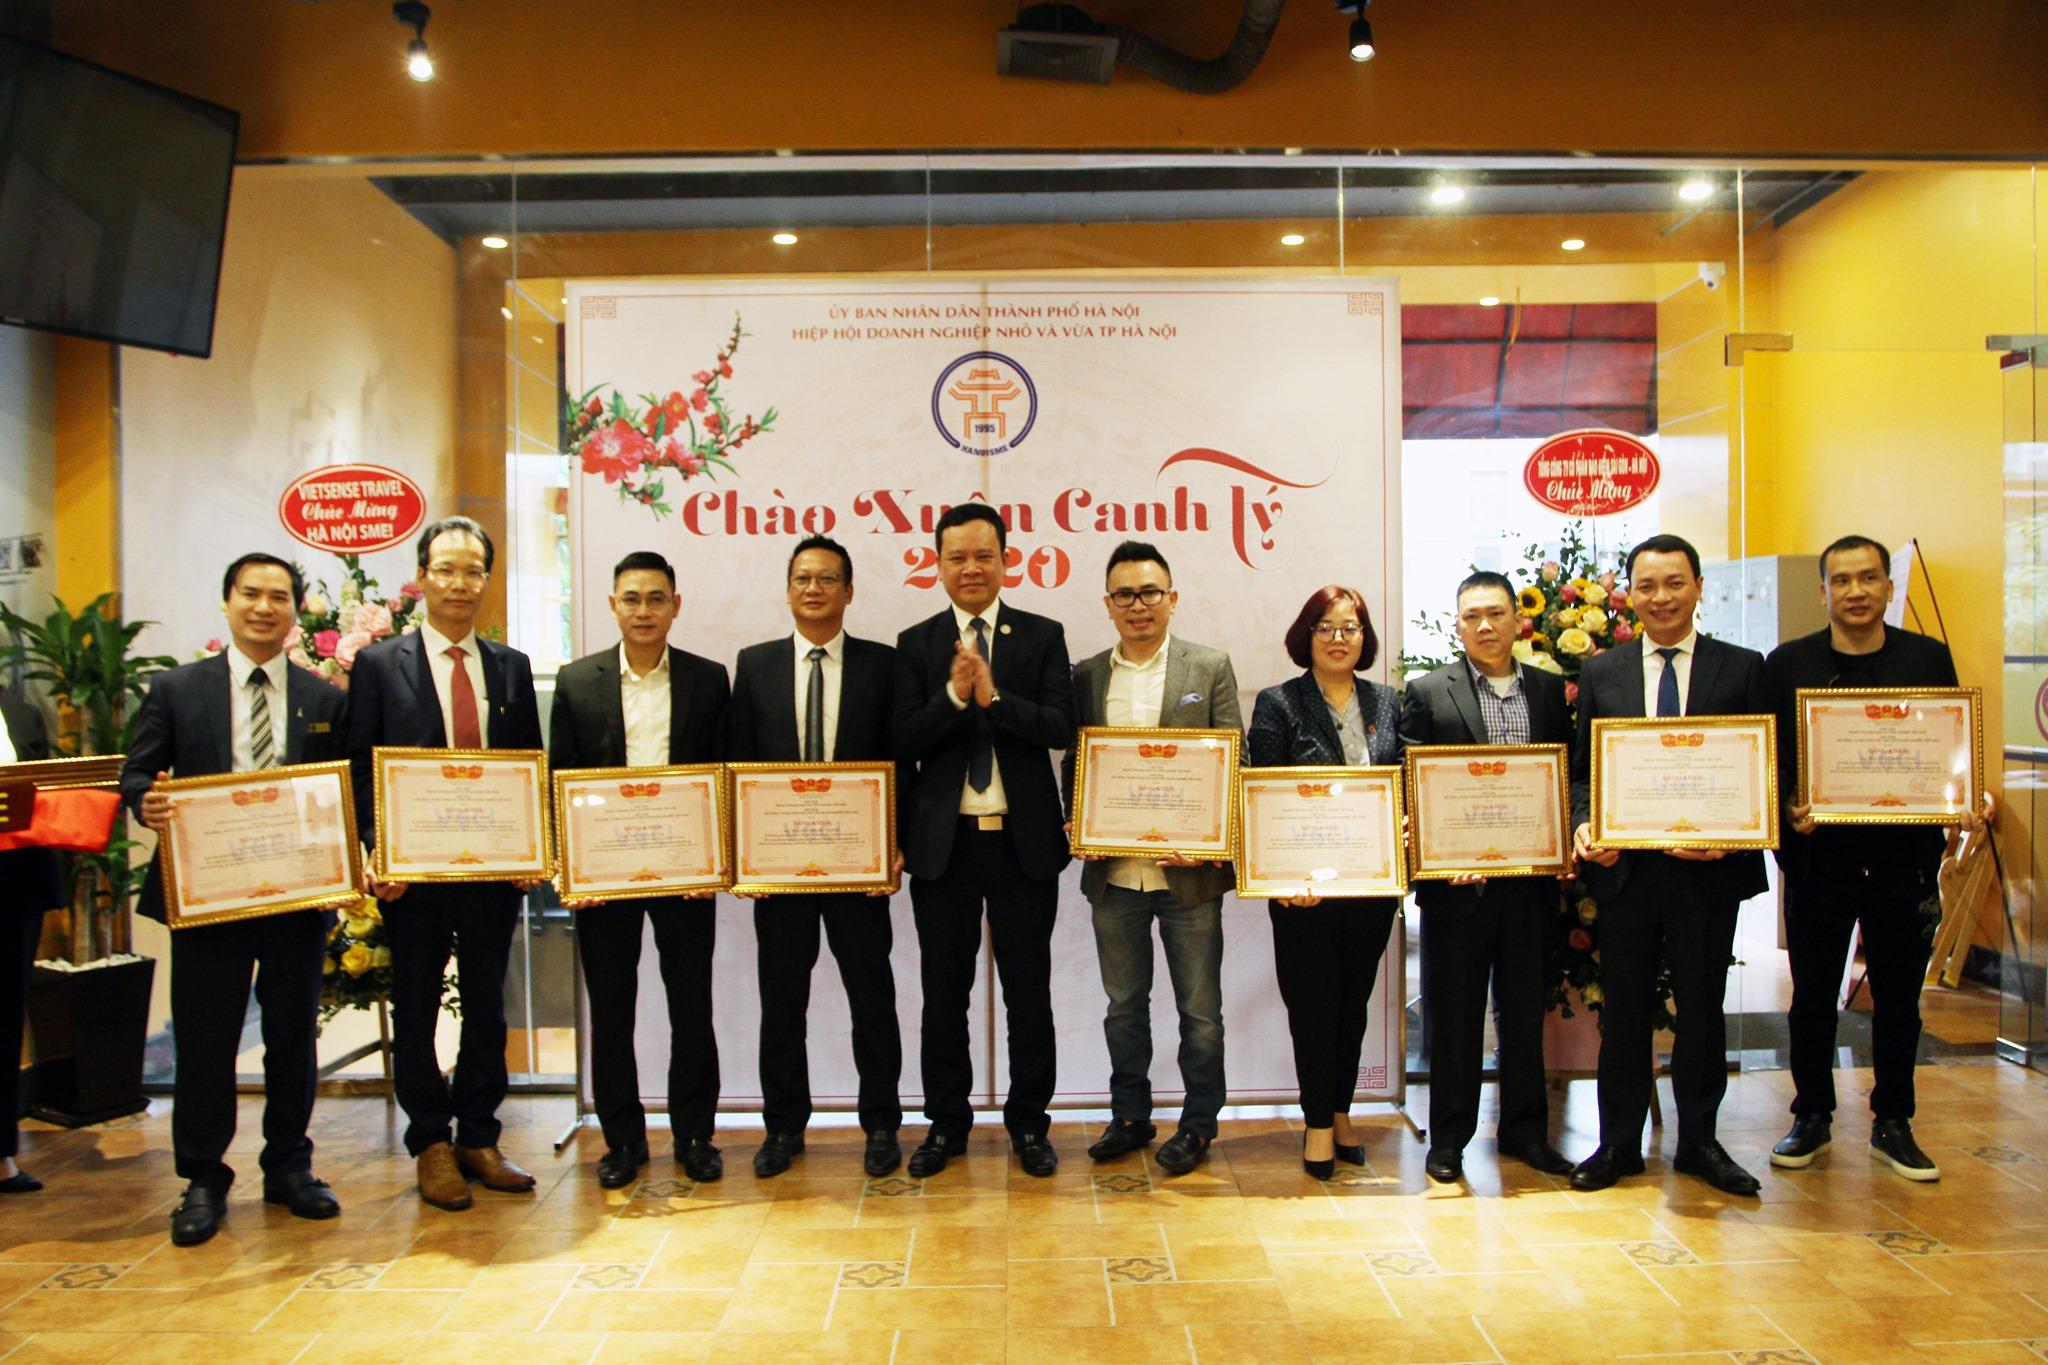 Adamo Studio receives the certificate of merit from VCCI